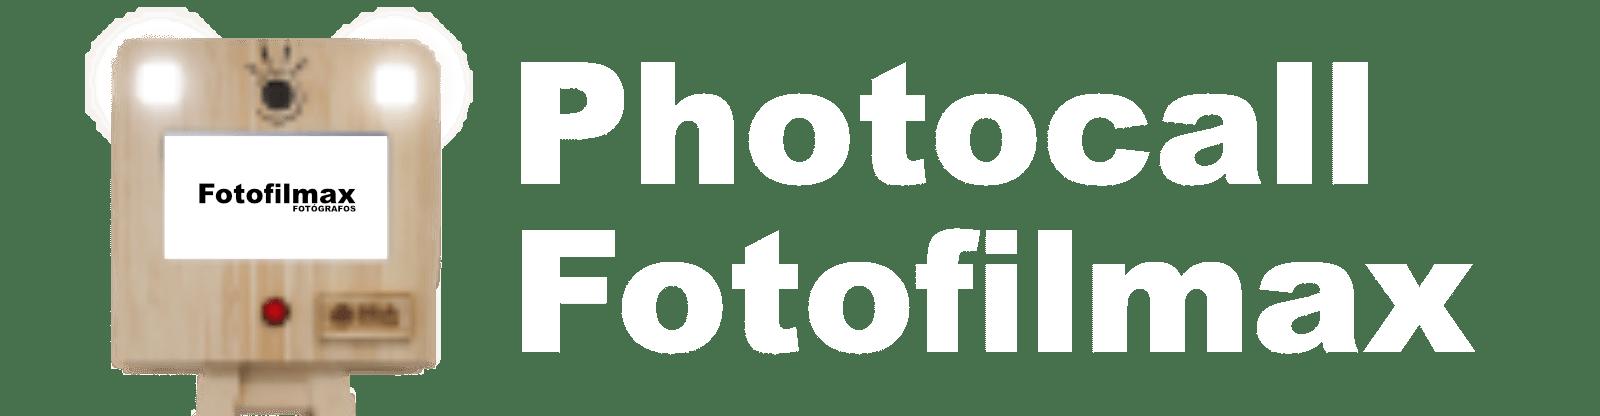 logowebphotocall